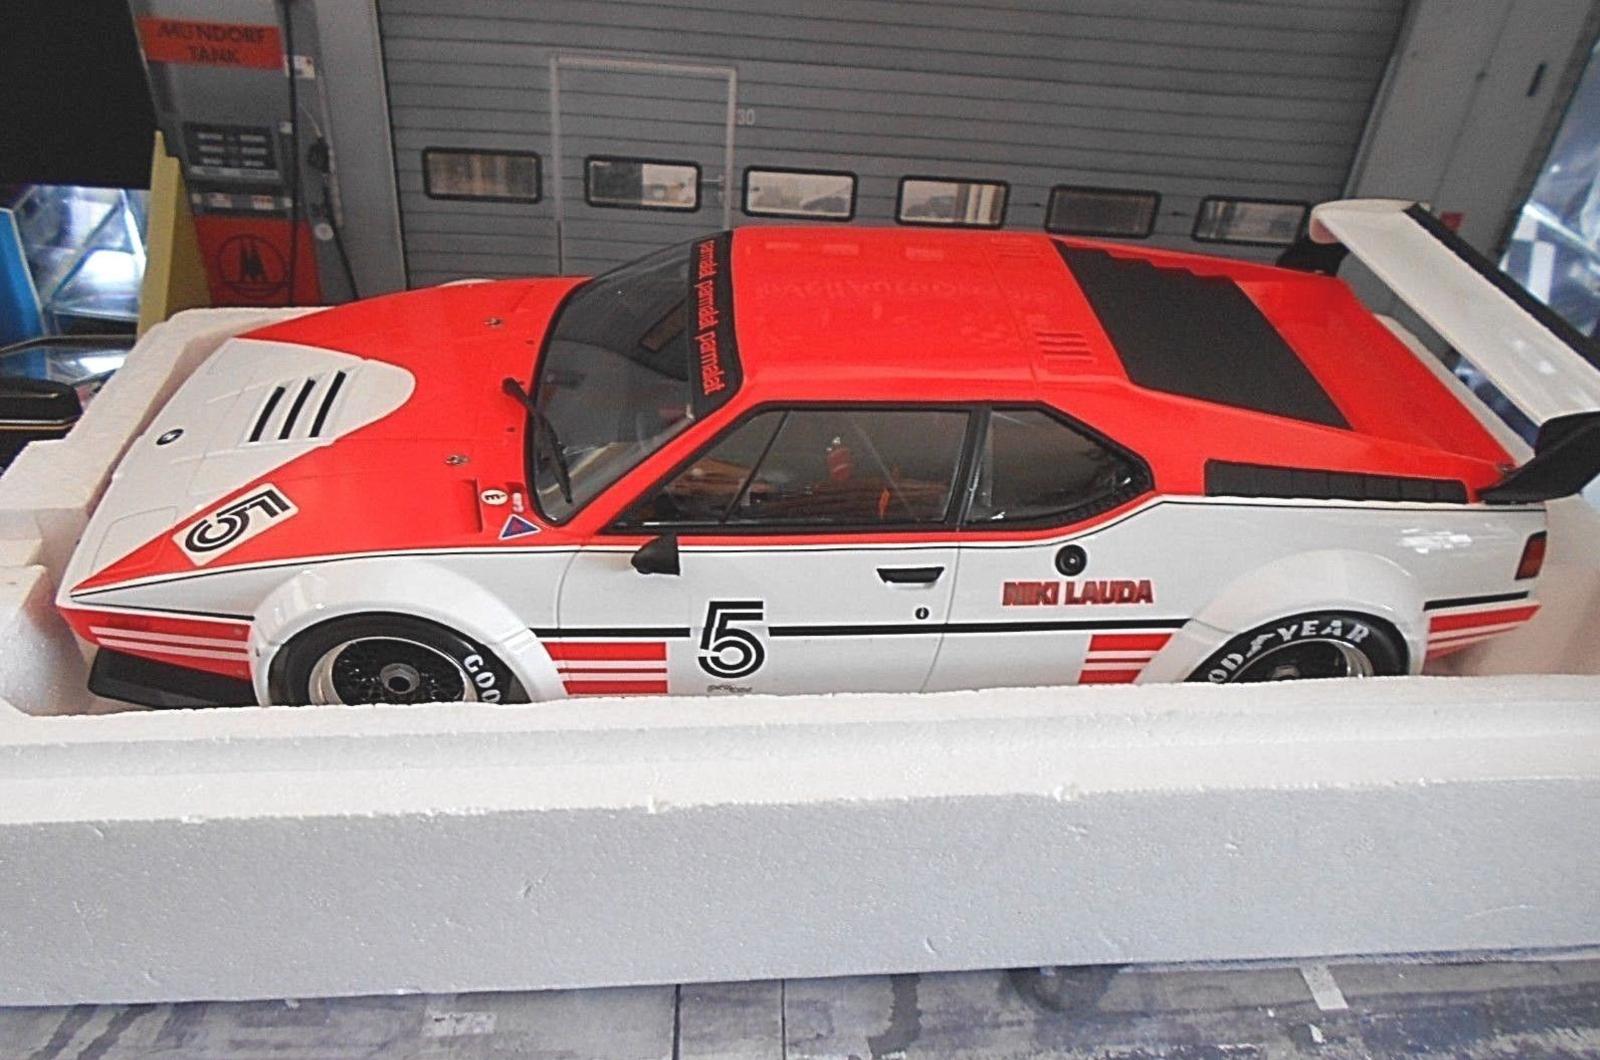 1 12 Minichamps BMW M1 Racing Procar Niki Lauda  5 1979 w  Marlboro Decals